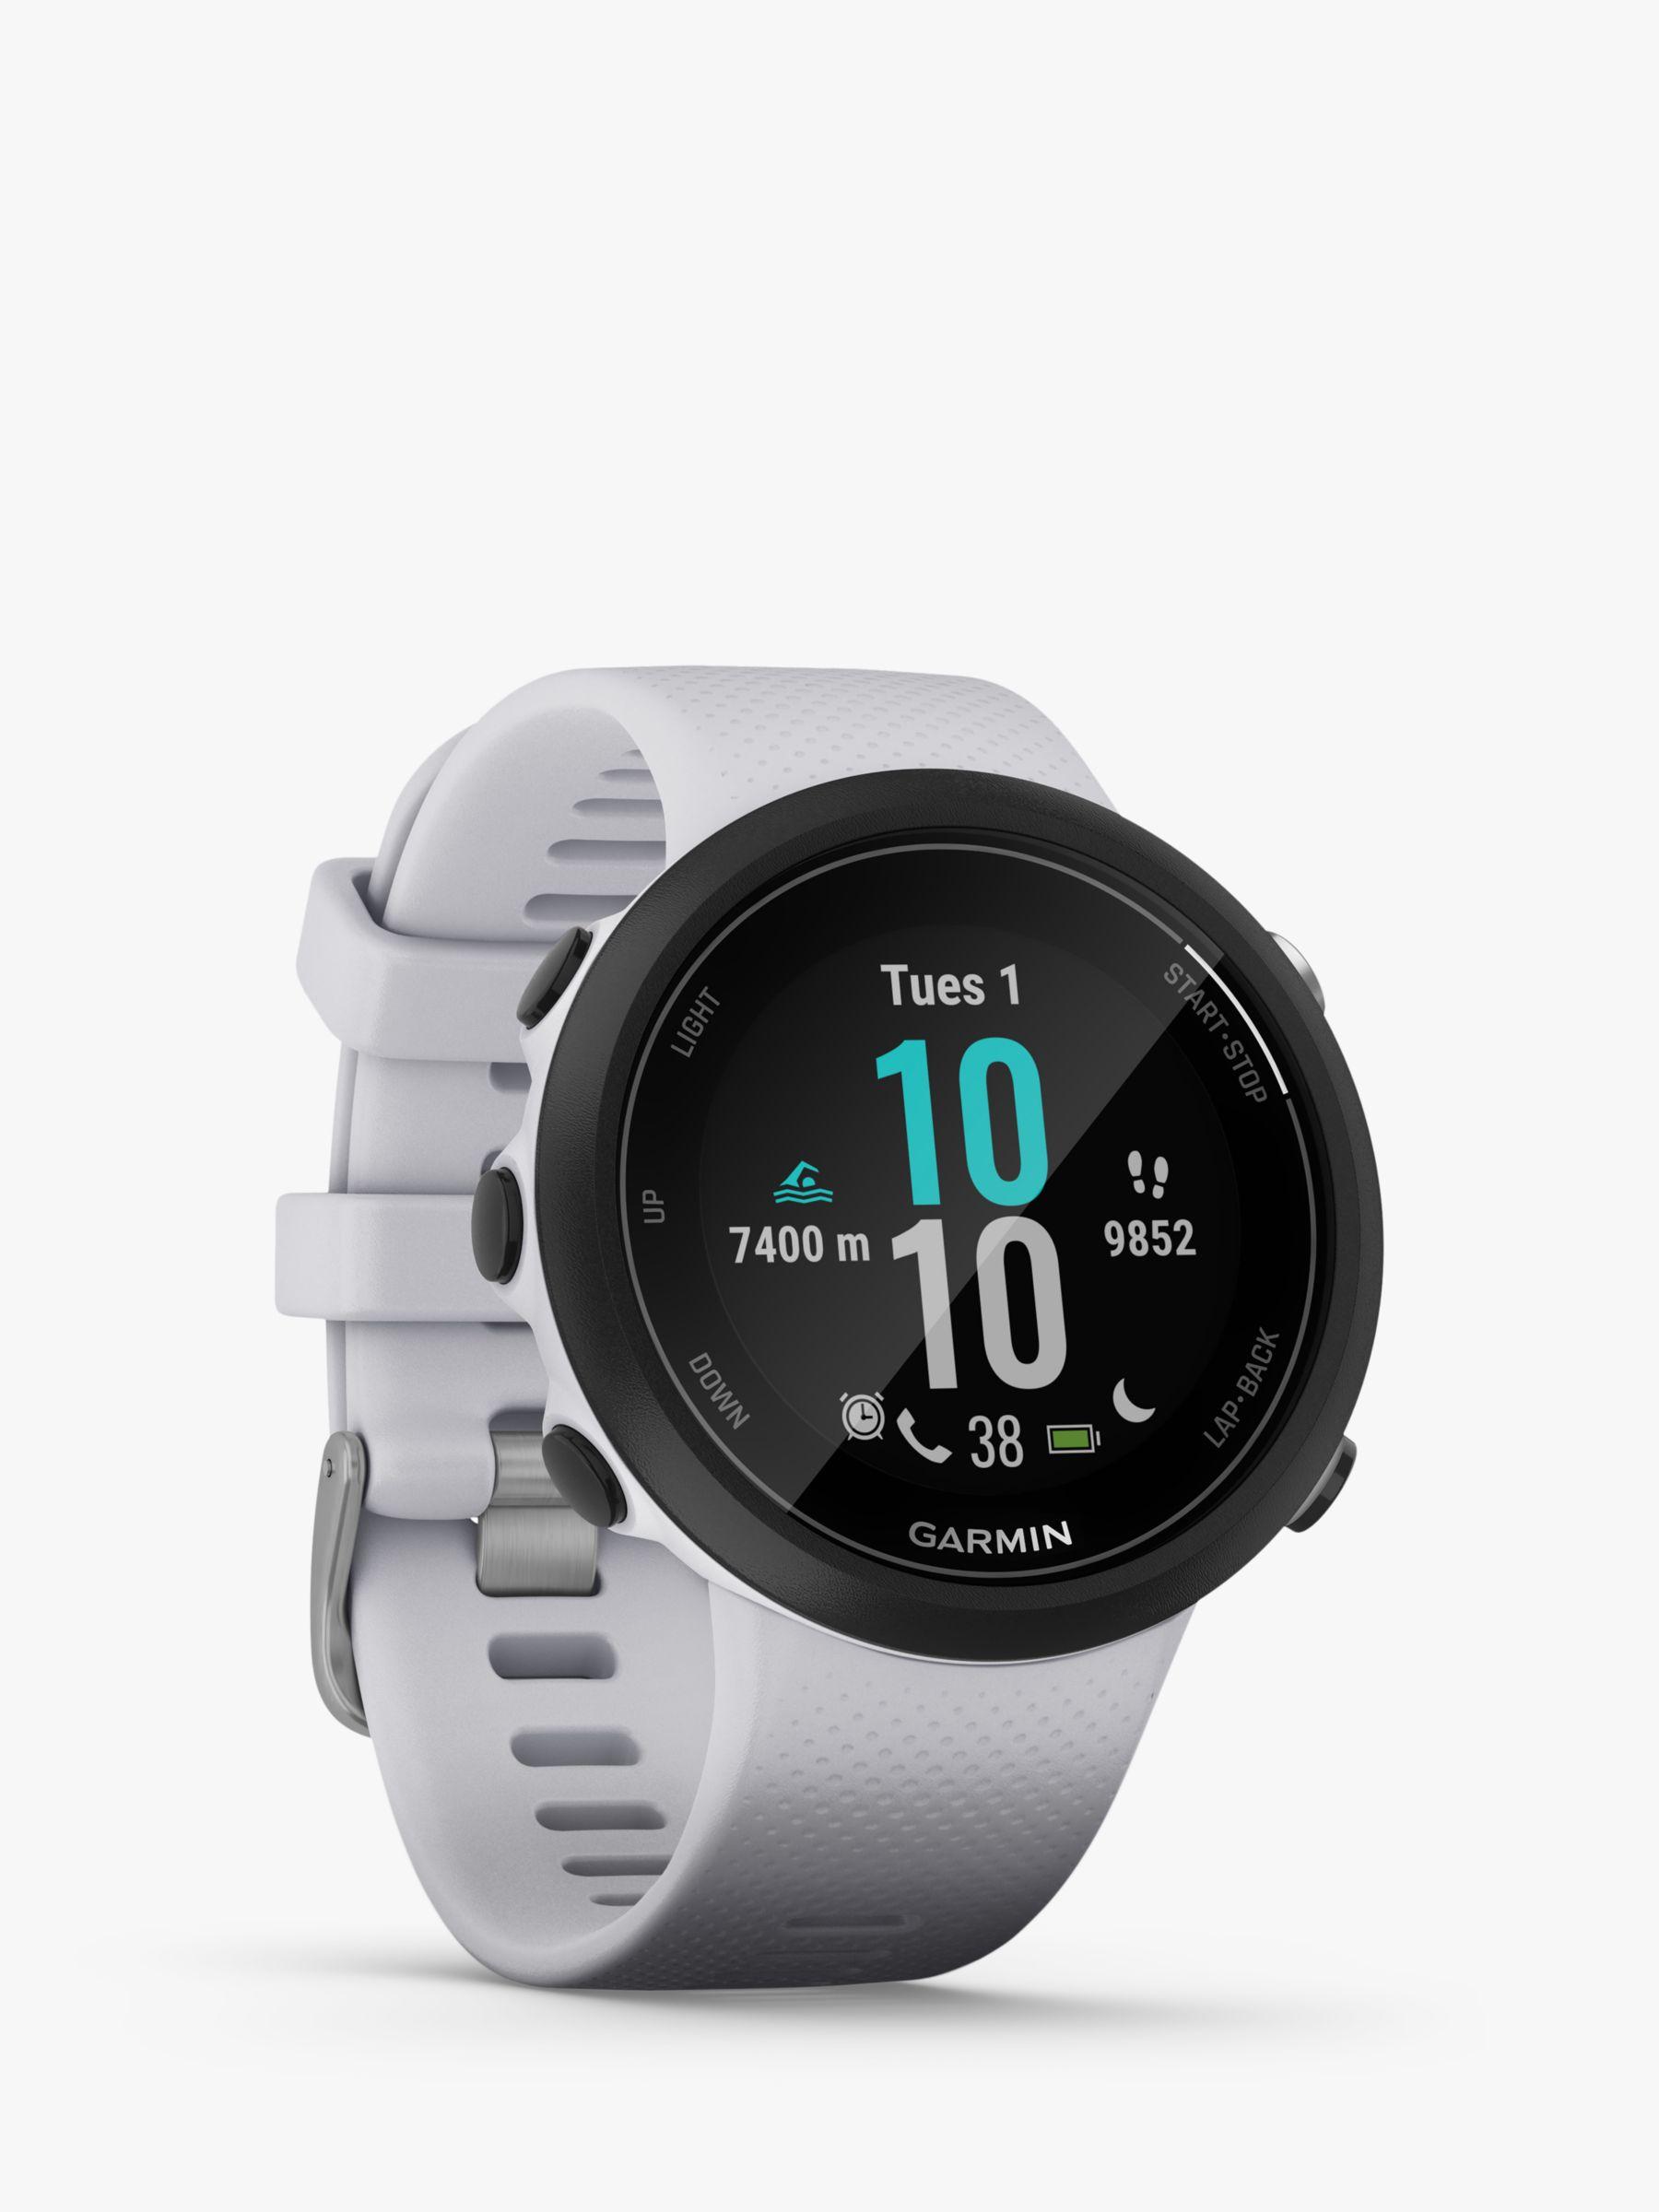 Garmin Garmin Swim 2, Bluetooth Fitness Tracking Watch with GPS and HR Monitoring